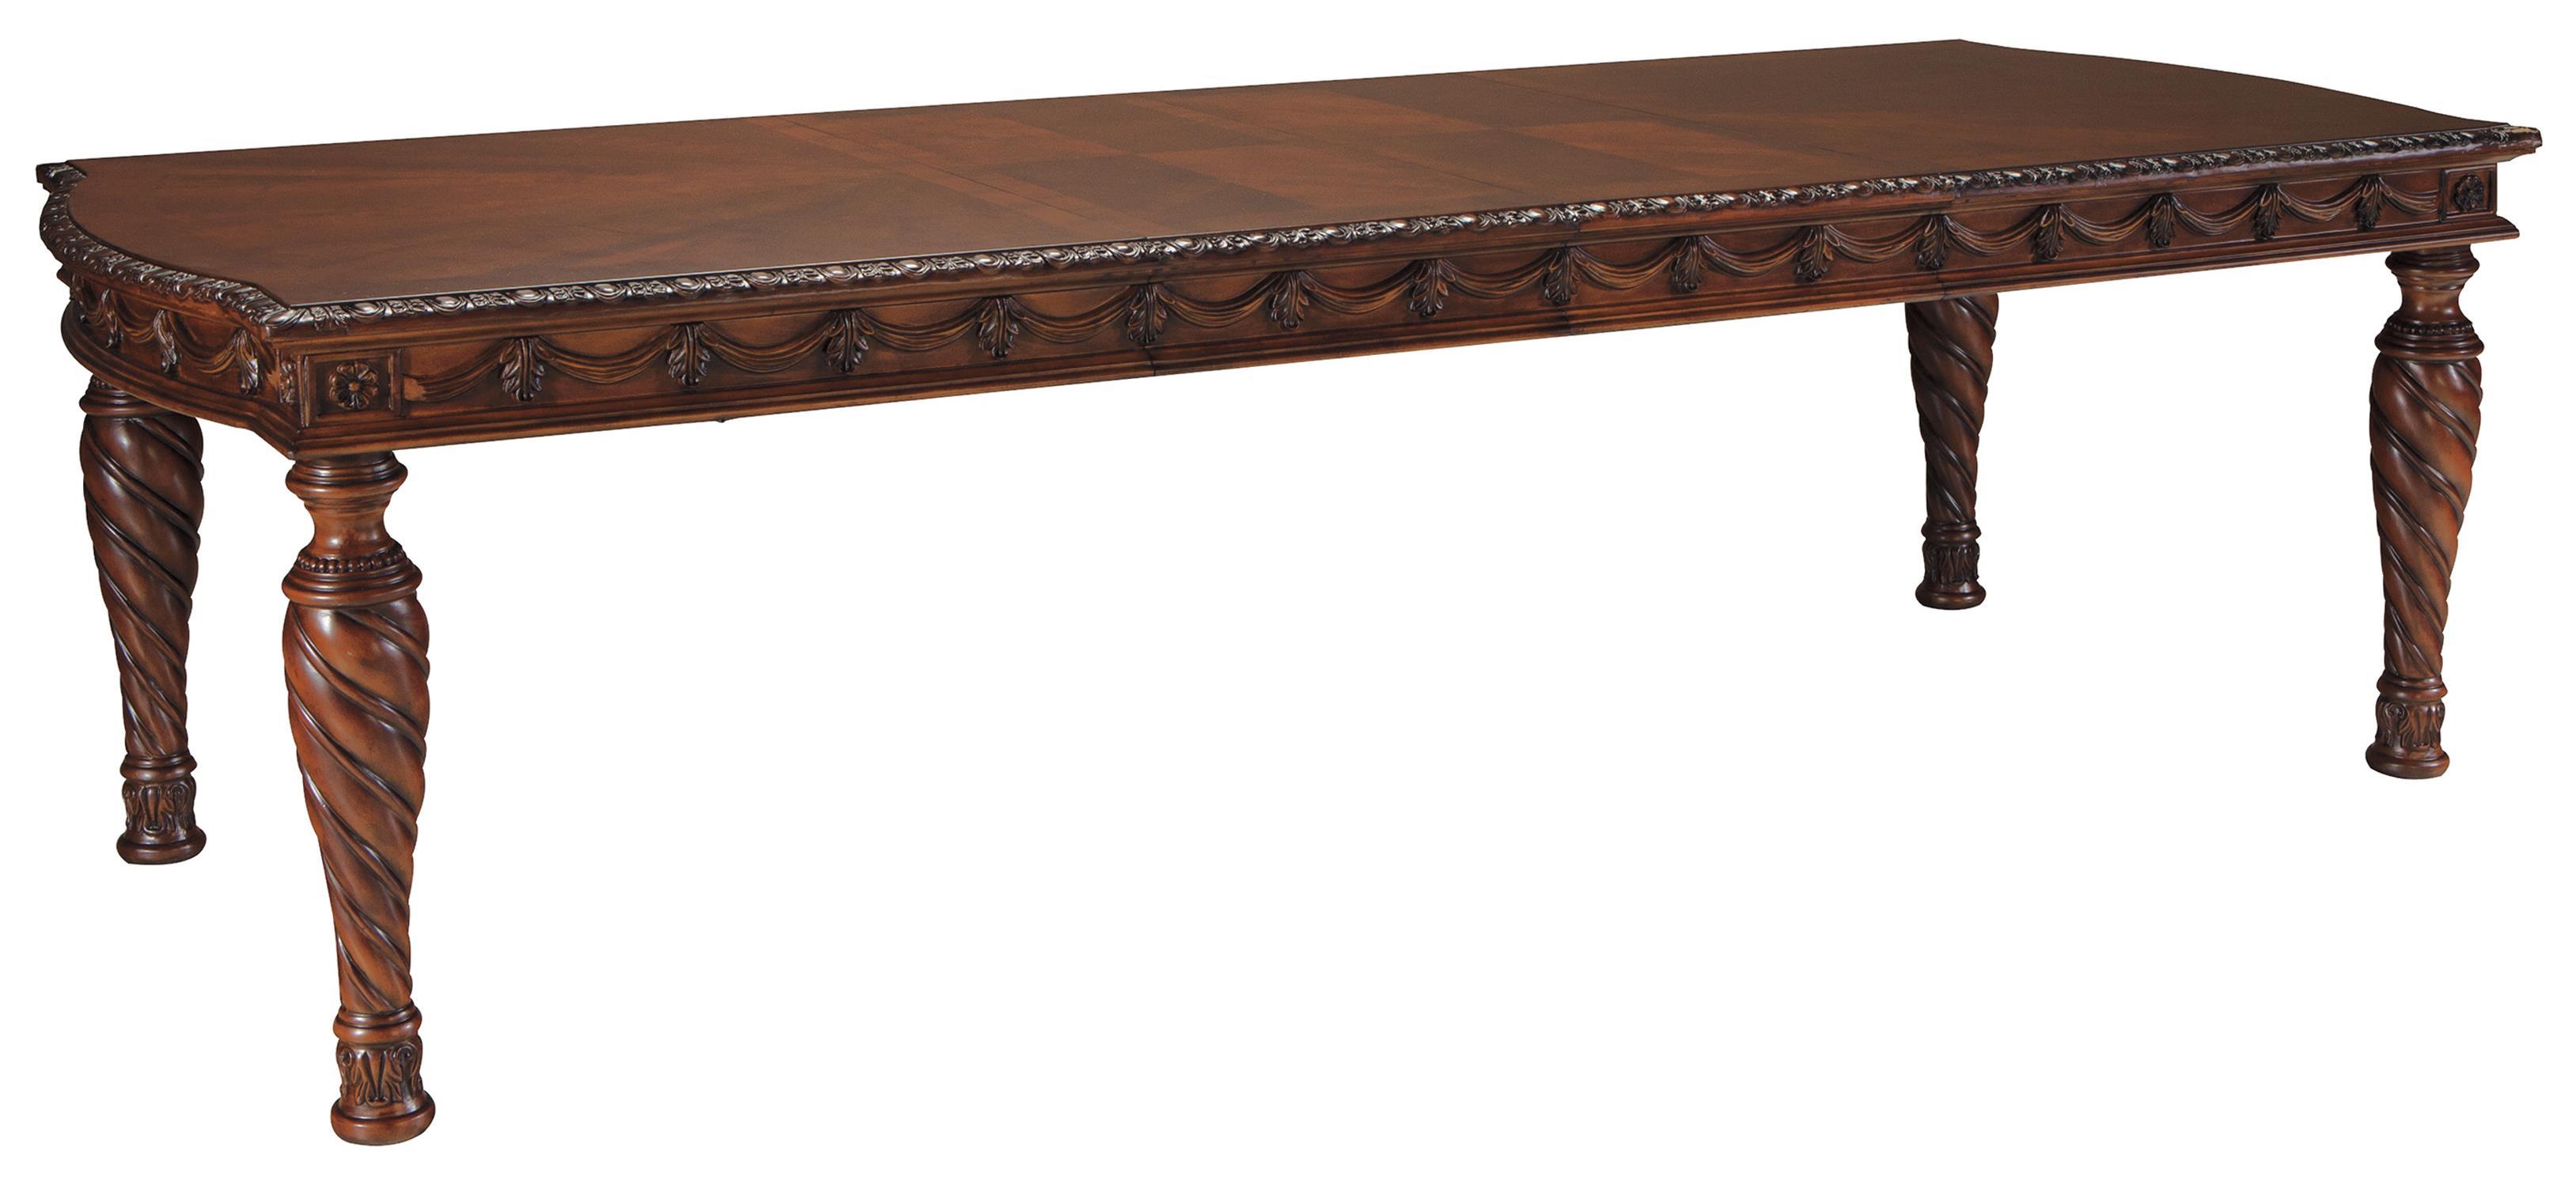 North Shore Rectangular Extension Table by Millennium at Lapeer Furniture & Mattress Center